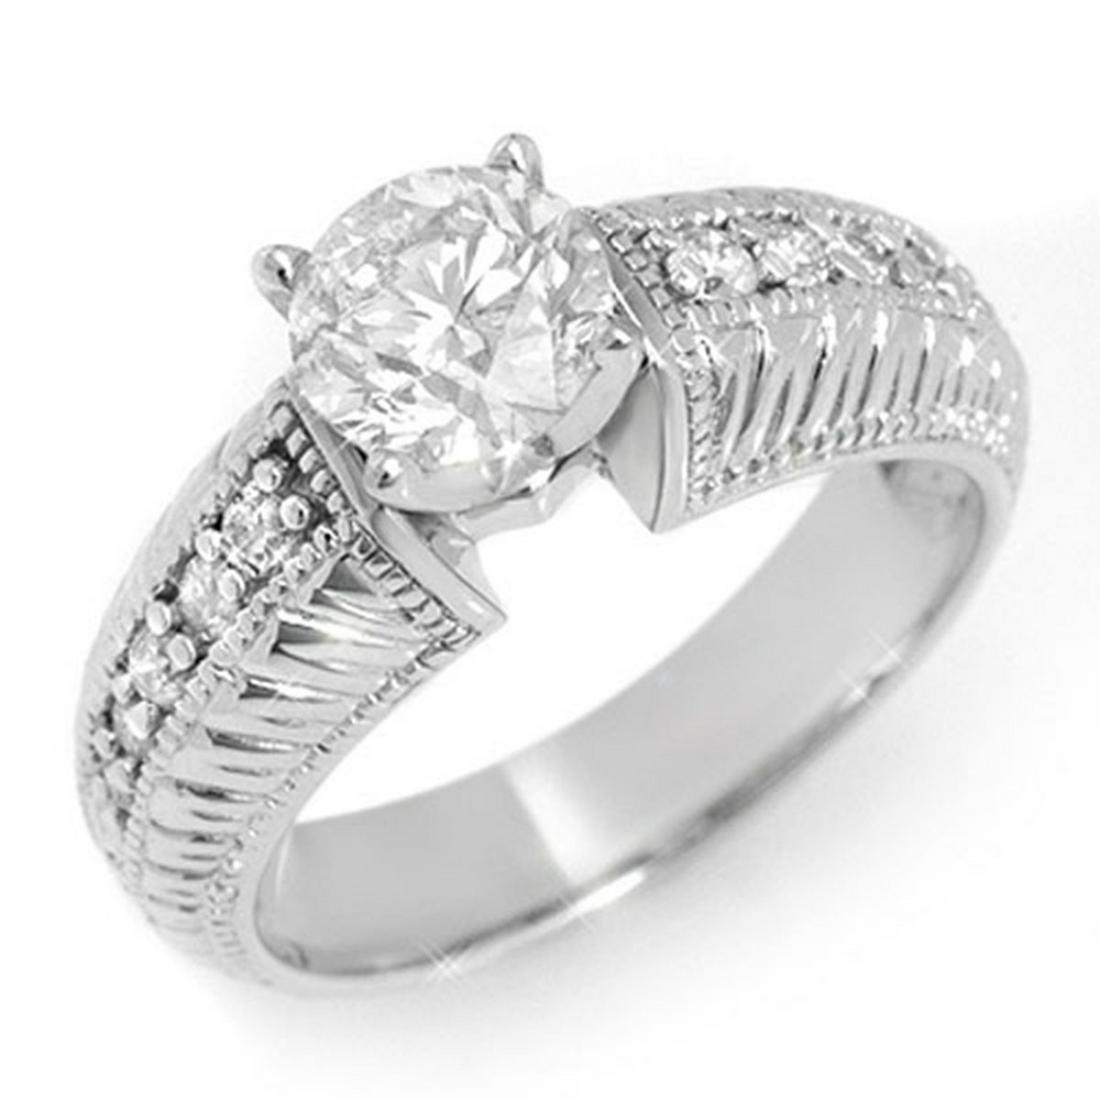 1.26 ctw VS/SI Diamond Ring 14K White Gold